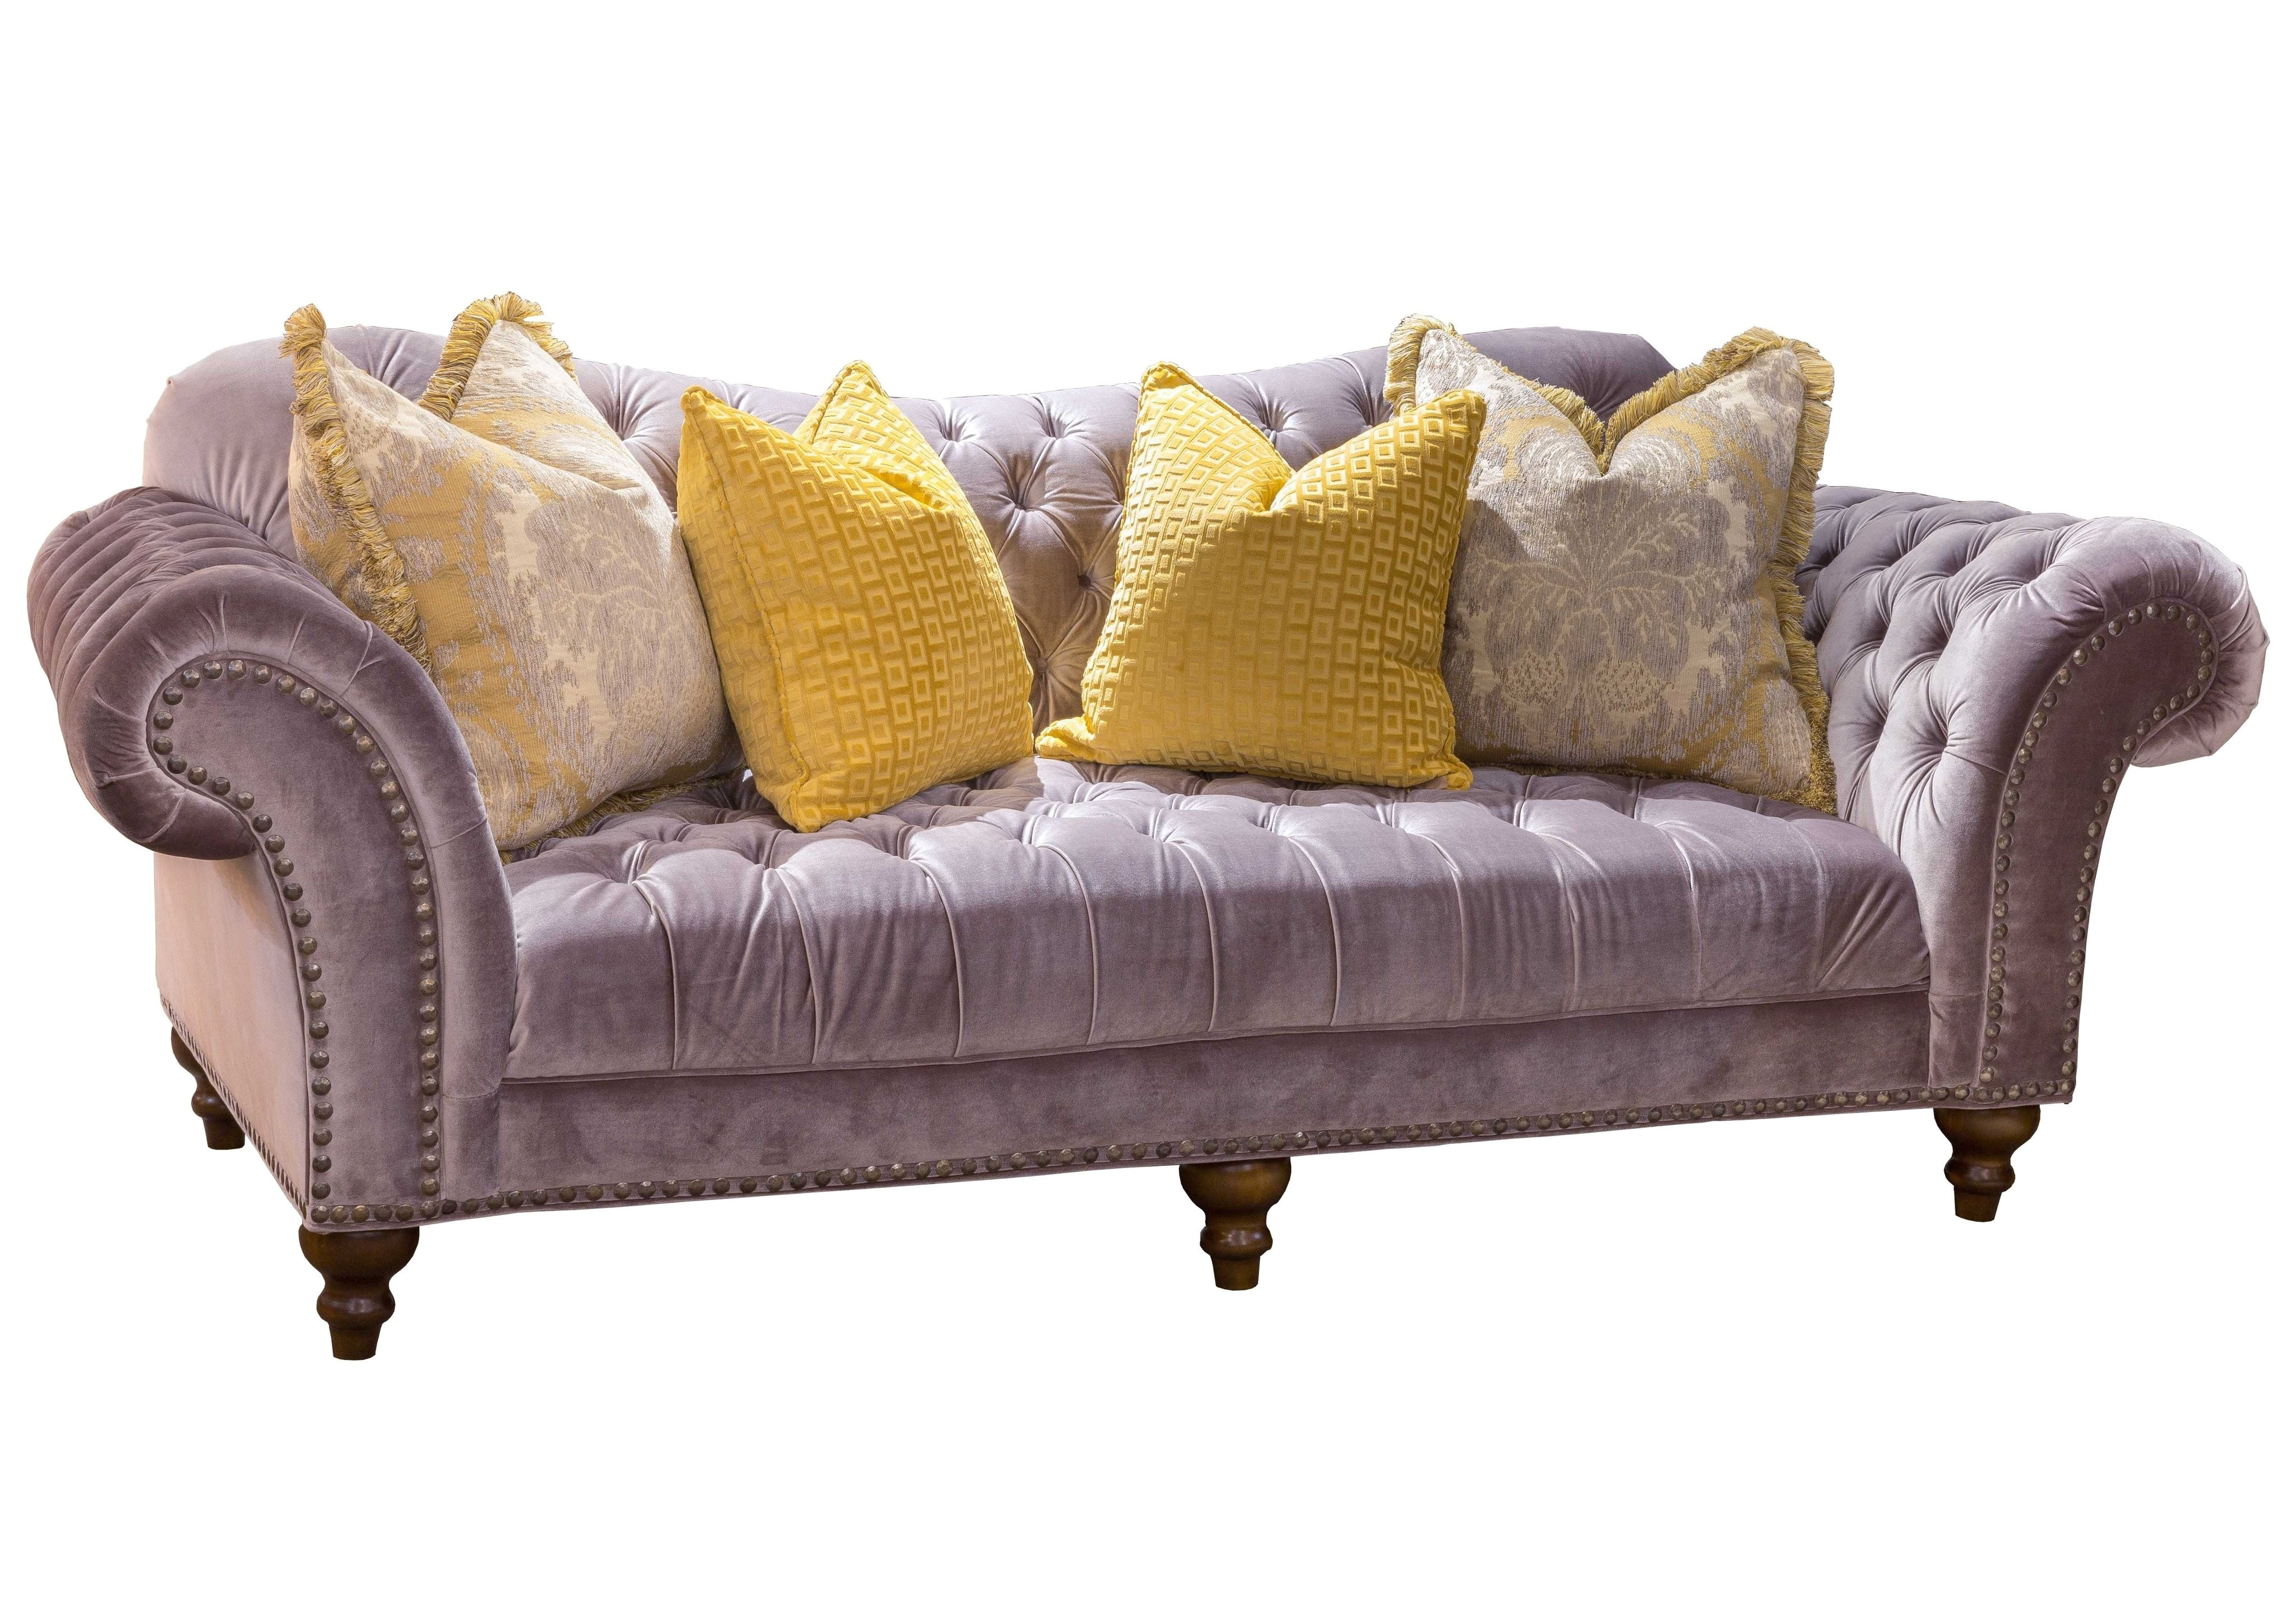 Boscov S Leather sofas Loveseat sofa Elegant Ethan Pillow top Queen Sleeper Beautiful